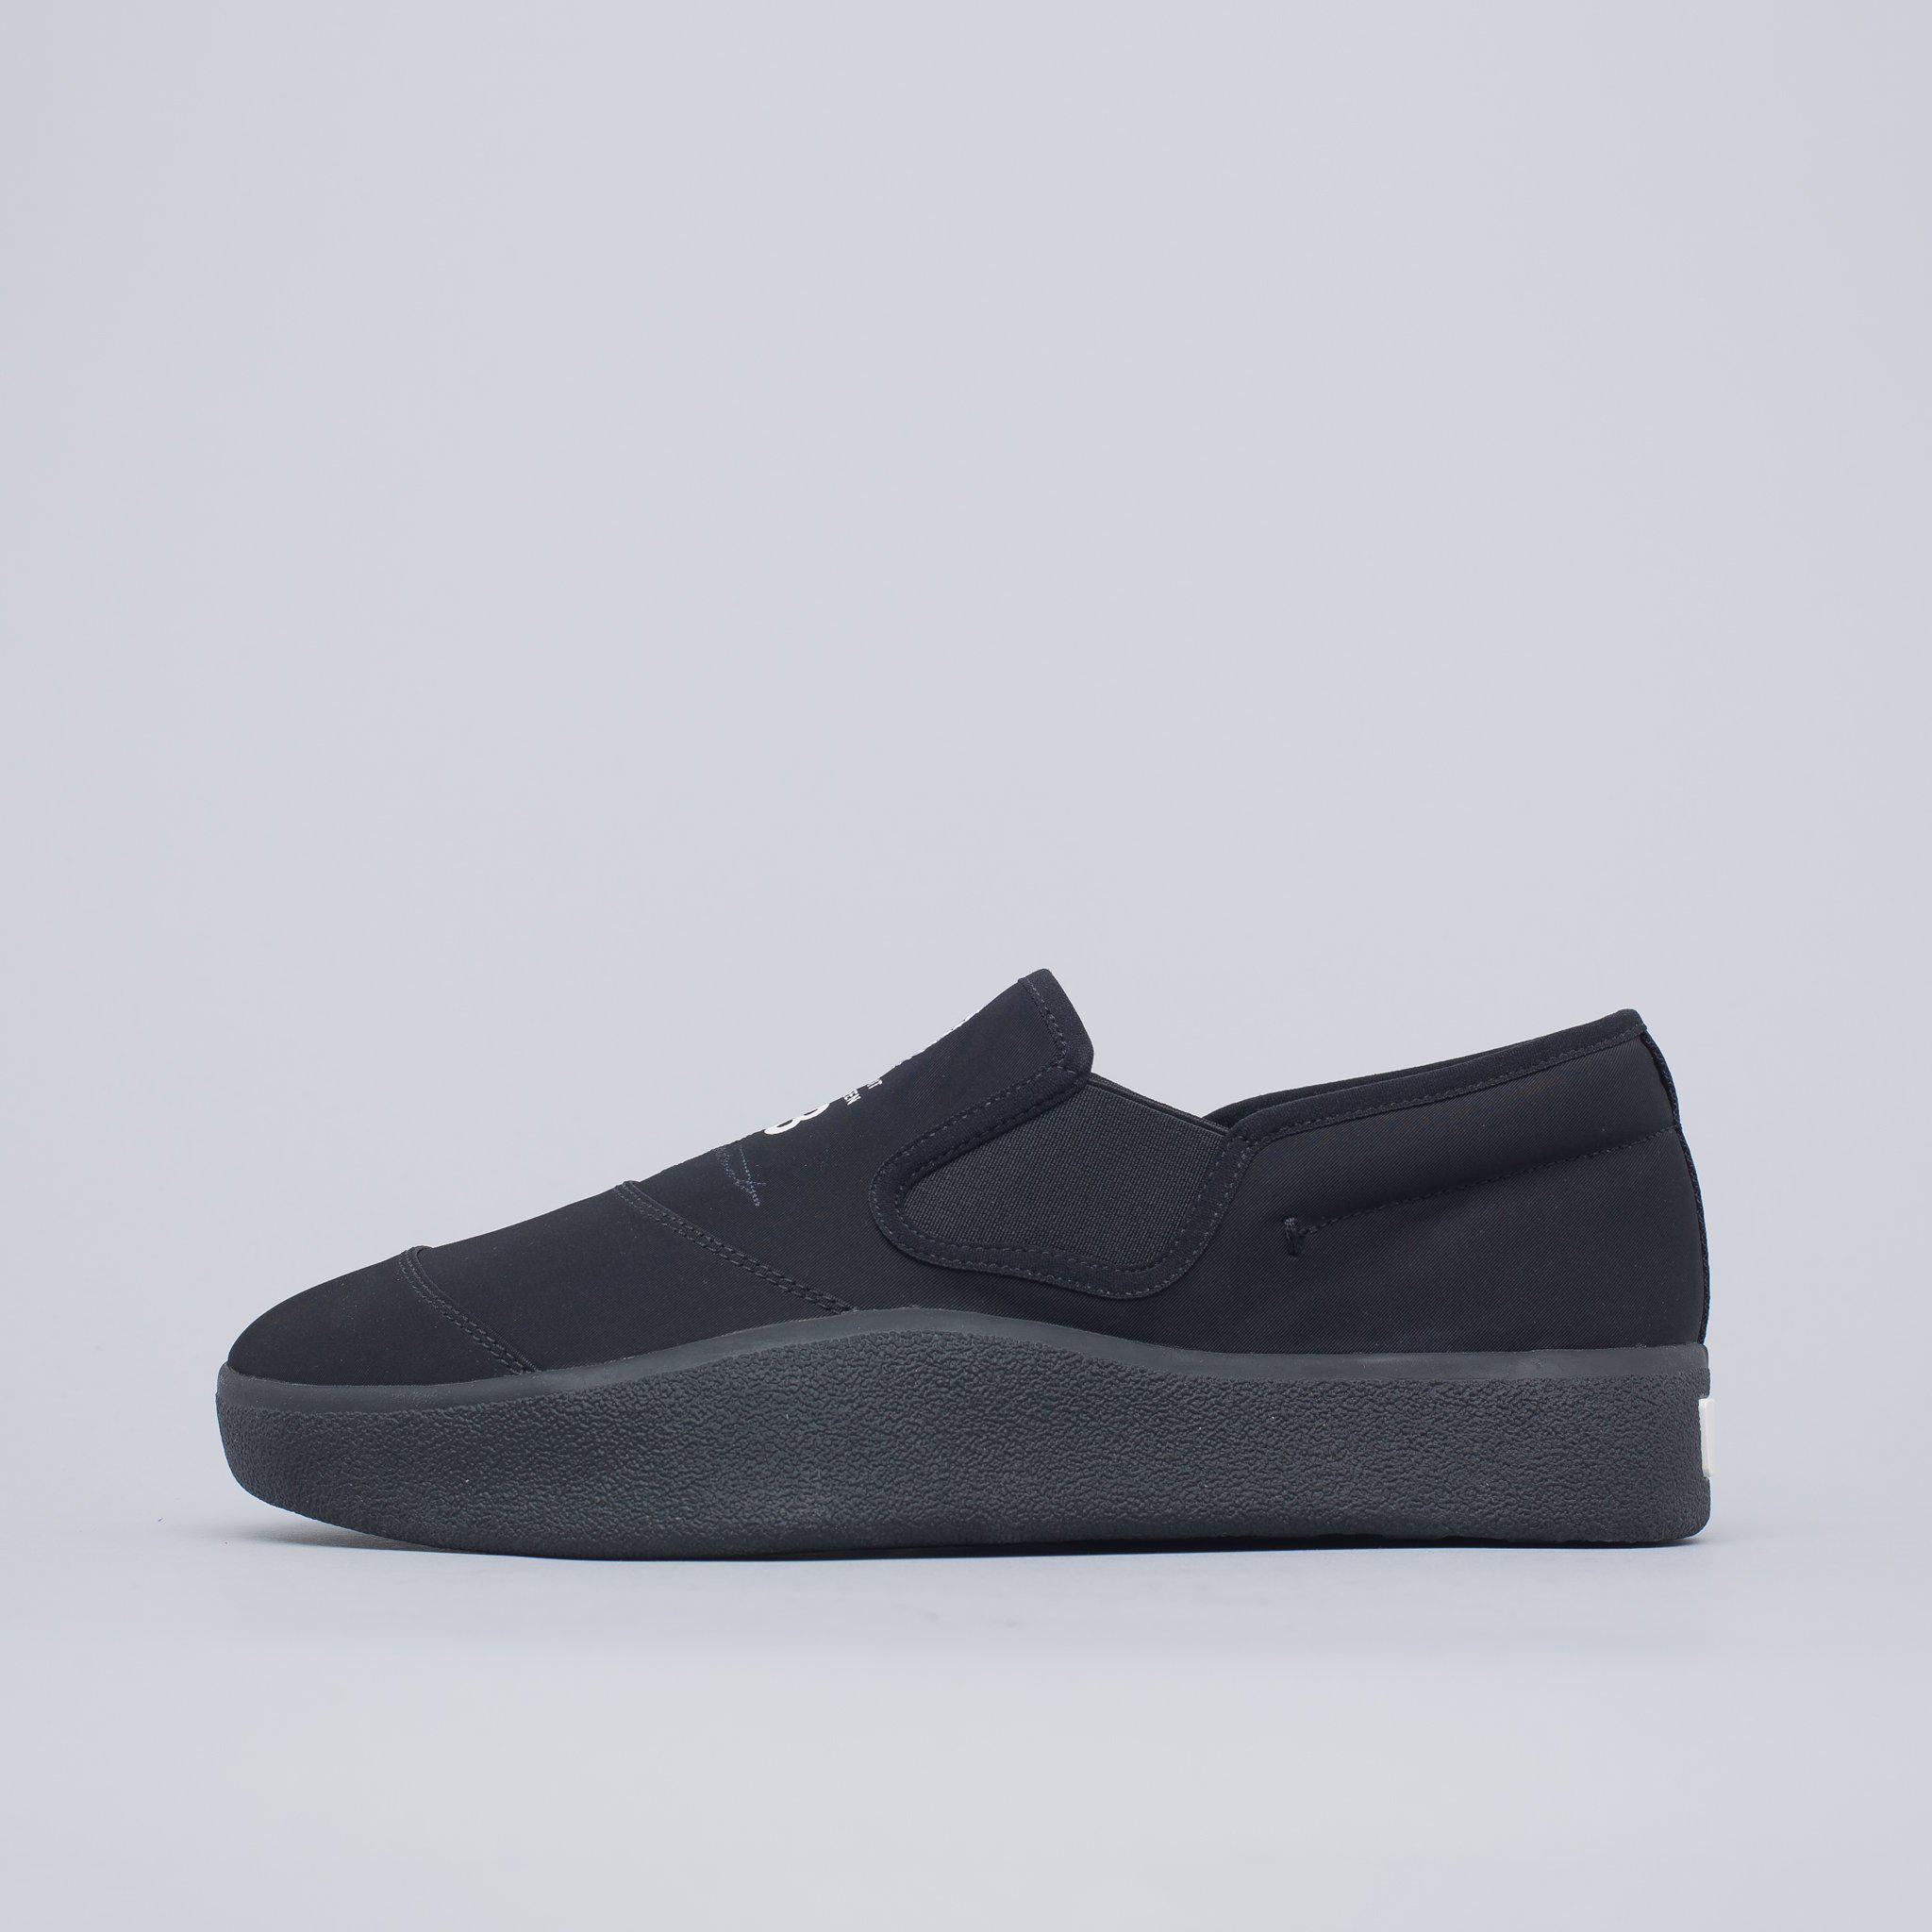 Y-3 Synthetic Tangutsu Slip-on Sneaker